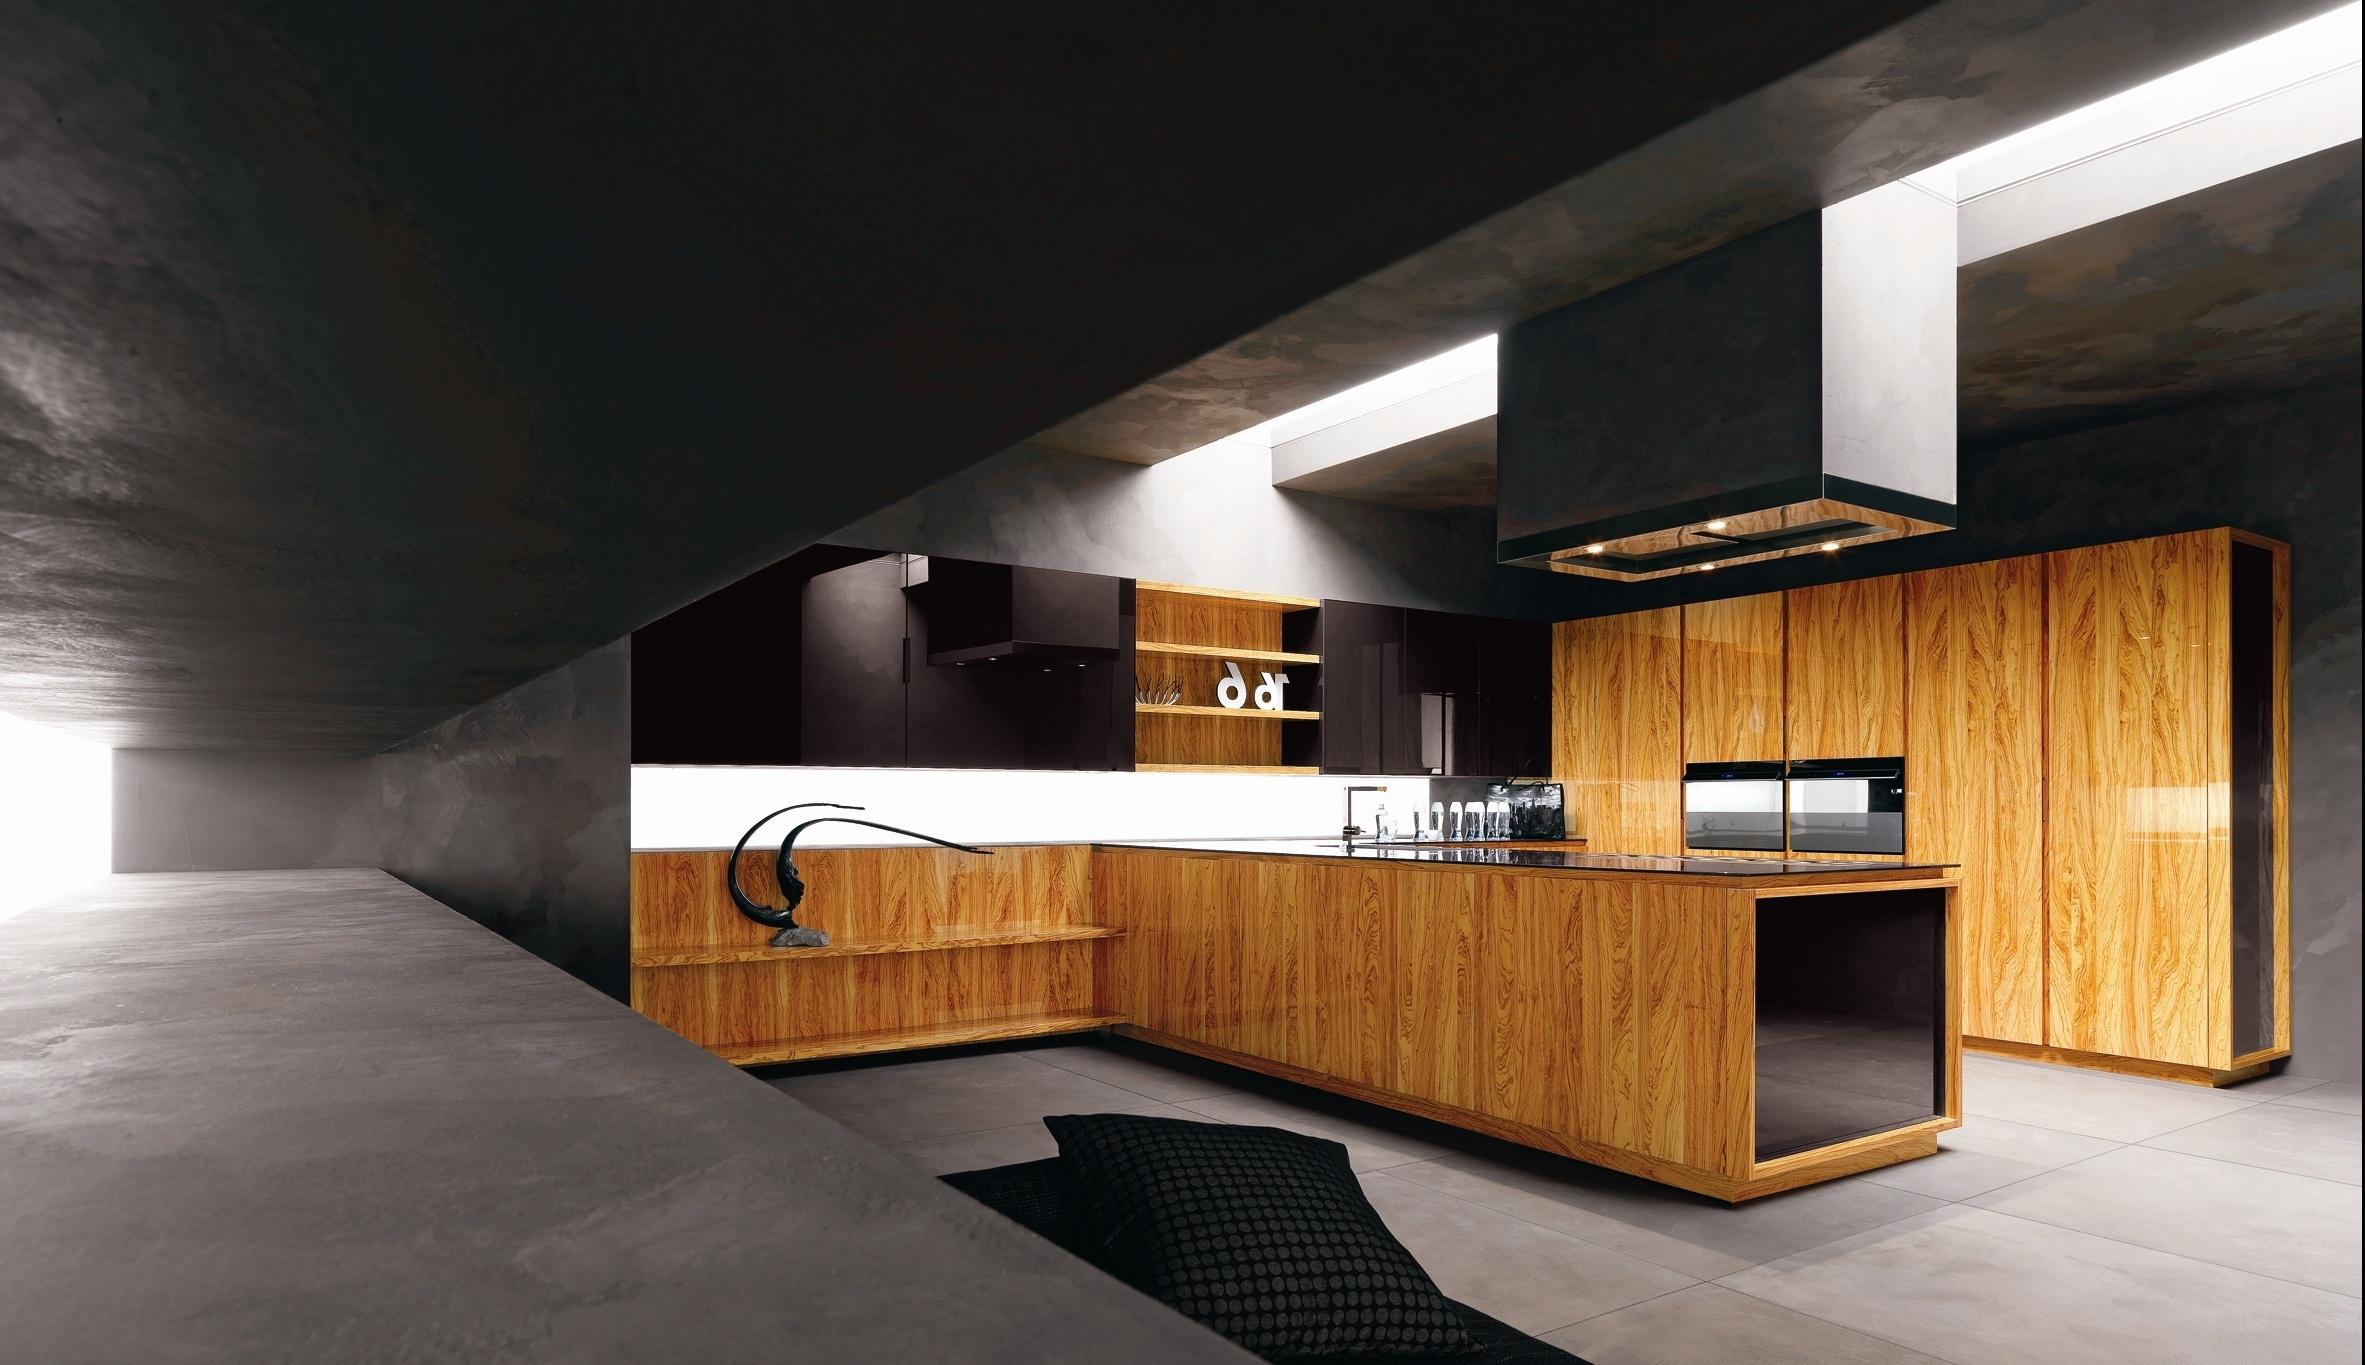 darren morgan on kitchen design: the wow maker